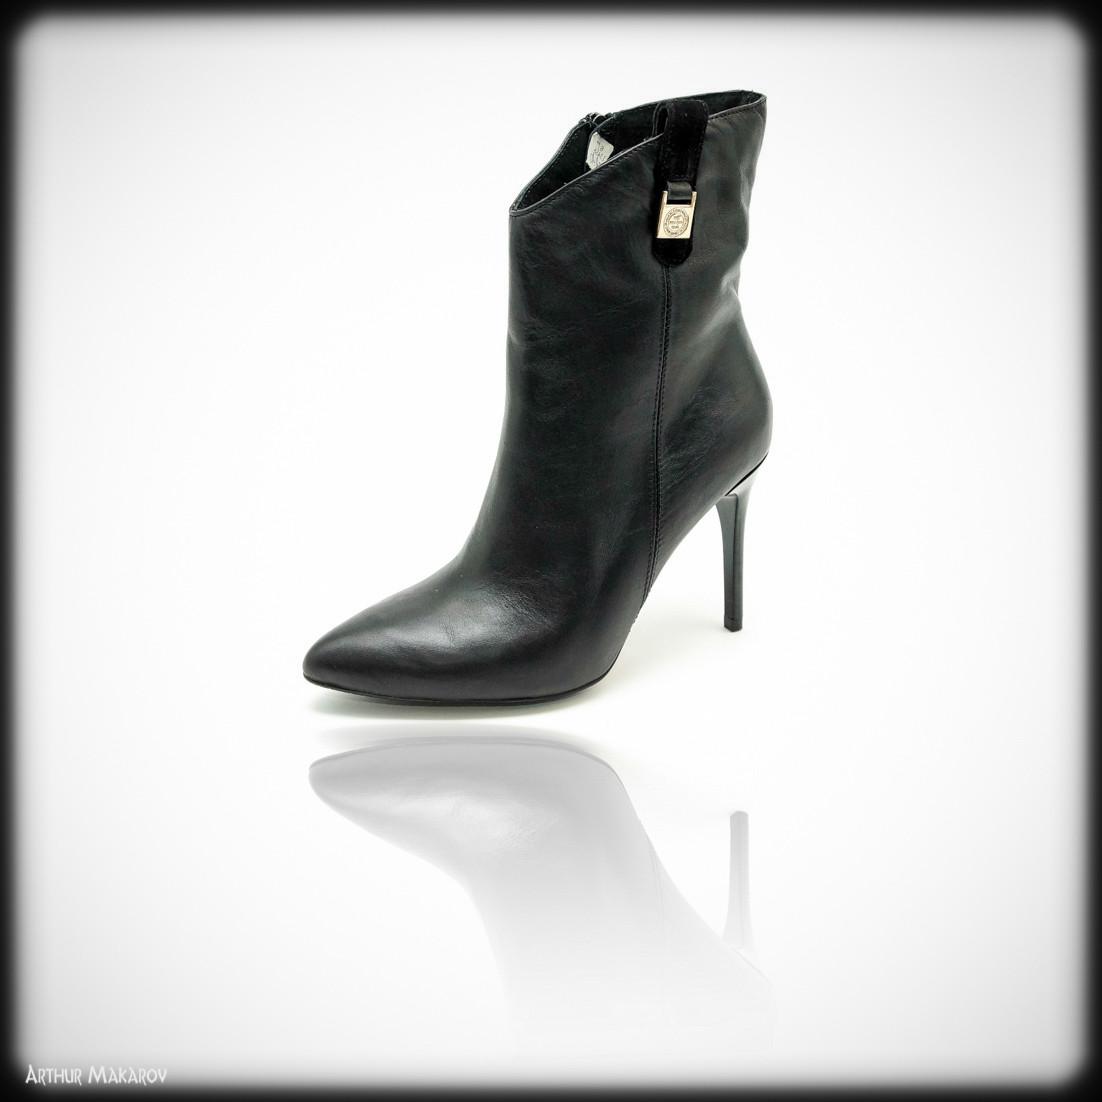 предметная съемка обуви - женский сапожек